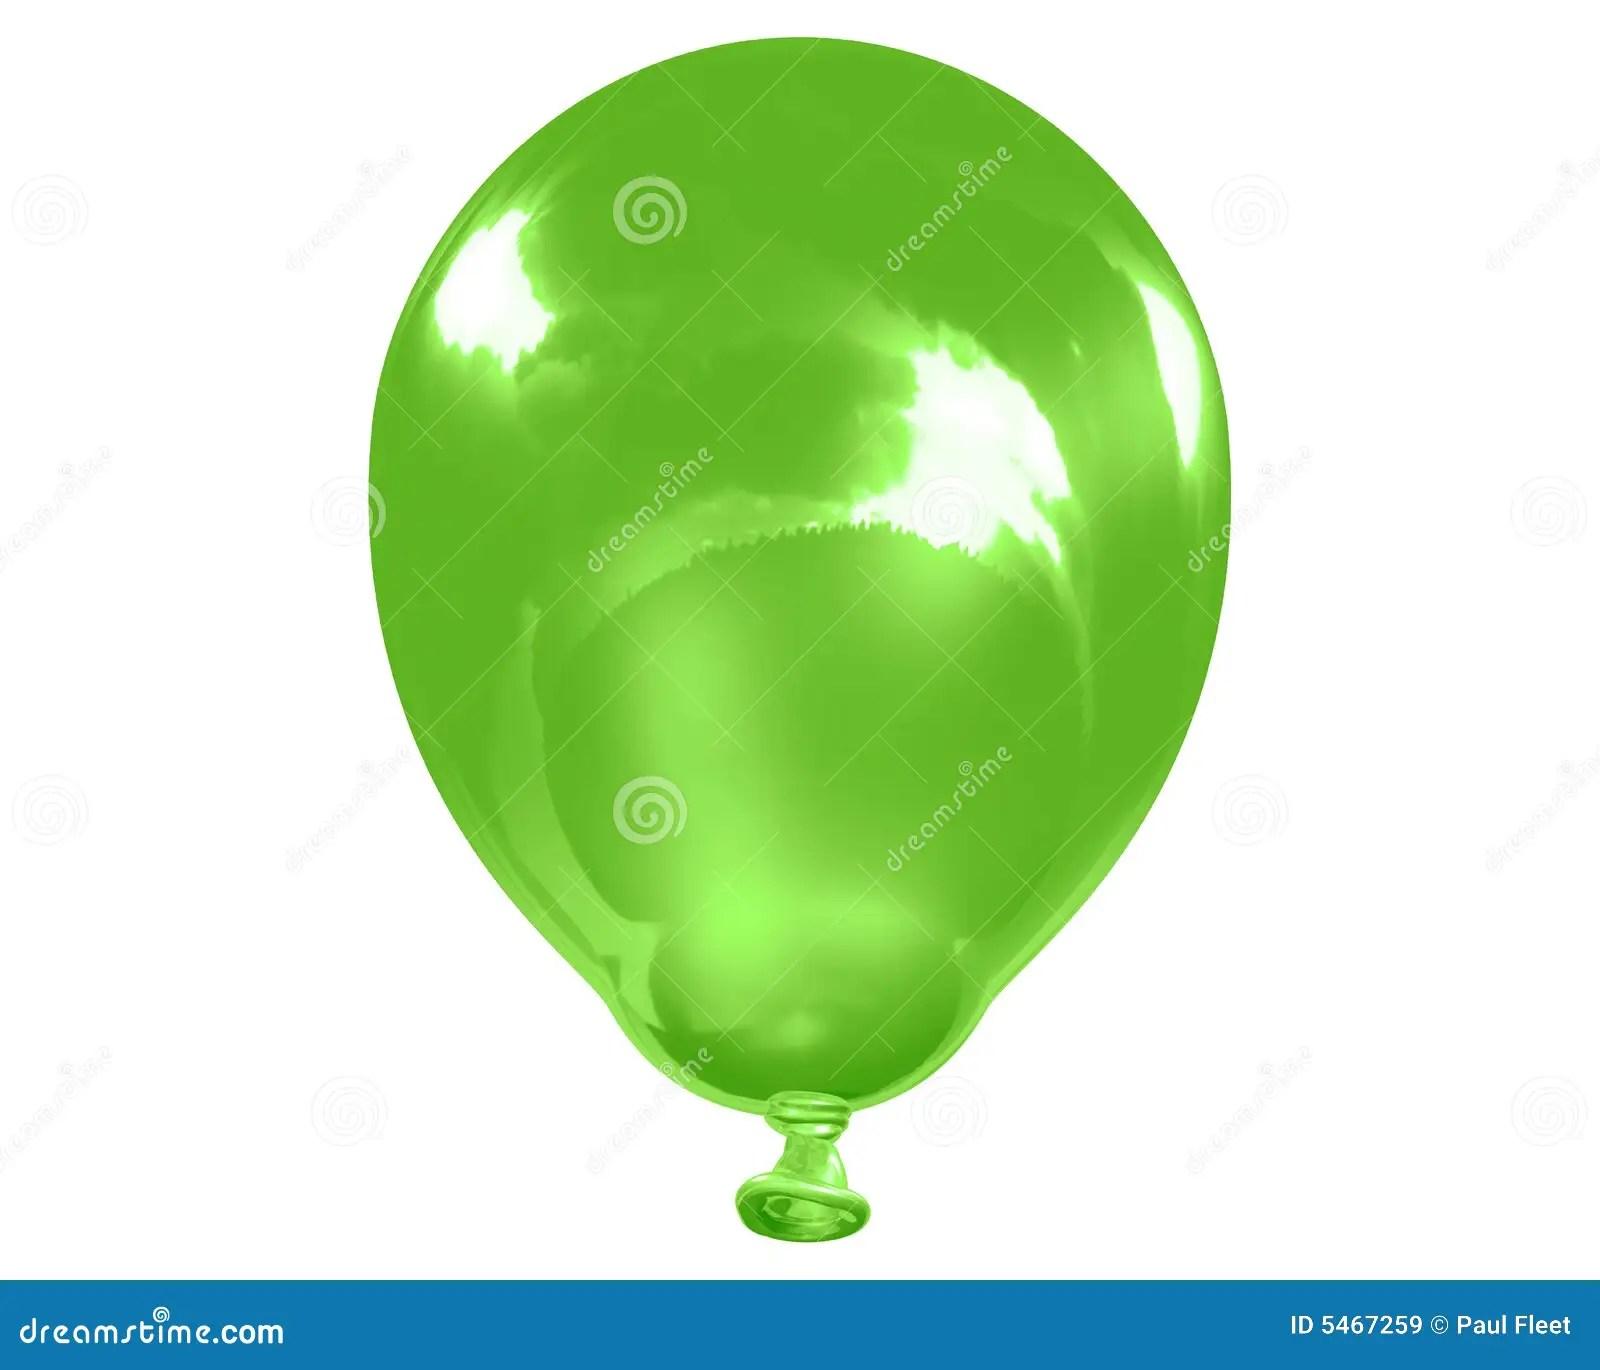 Single Reflective Green Balloon Royalty Free Stock Images